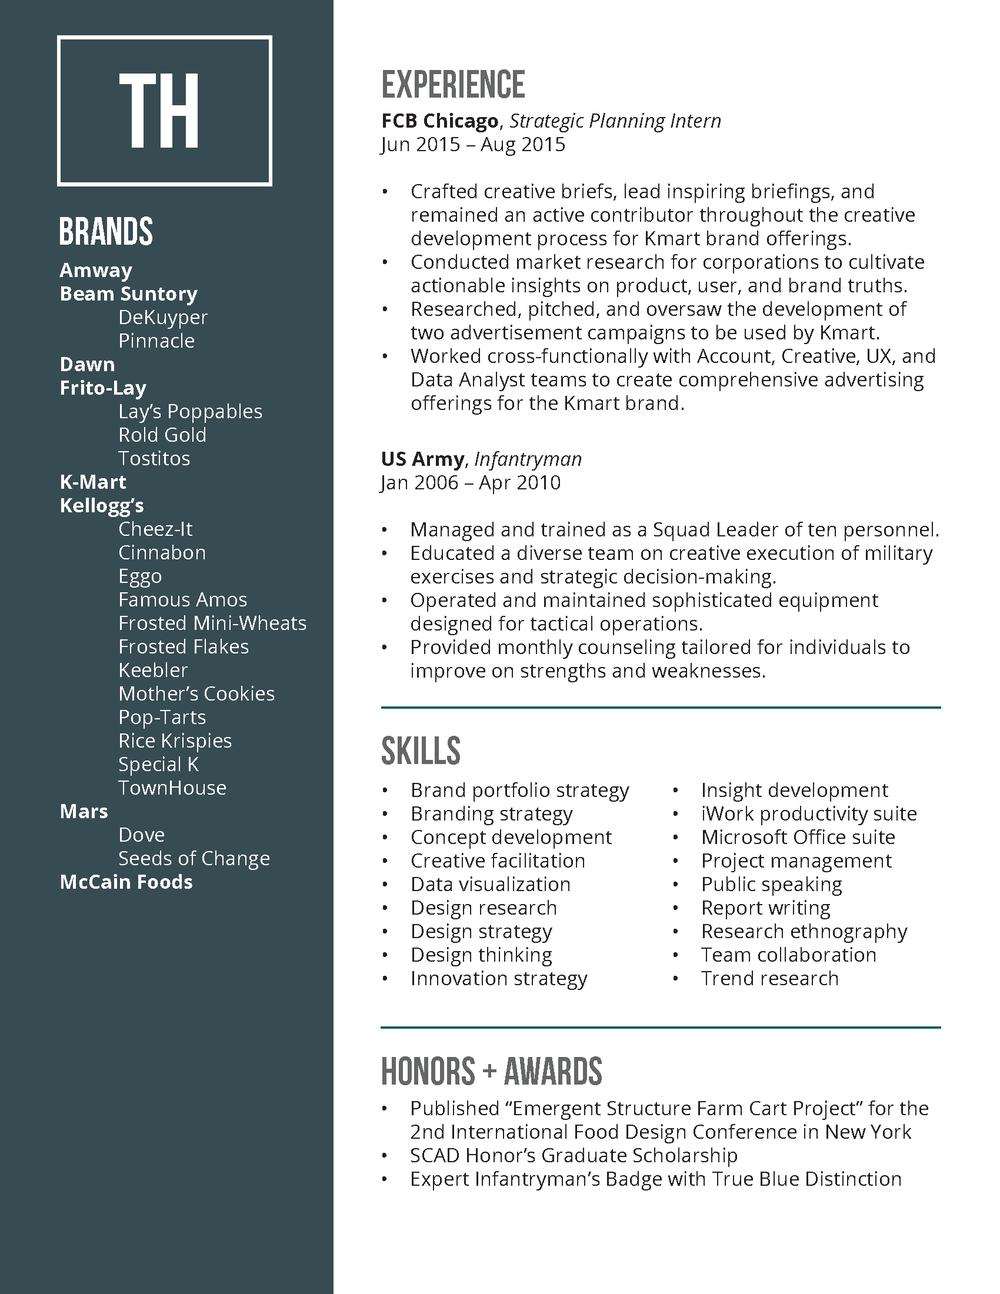 Resume — Todd Hinkle